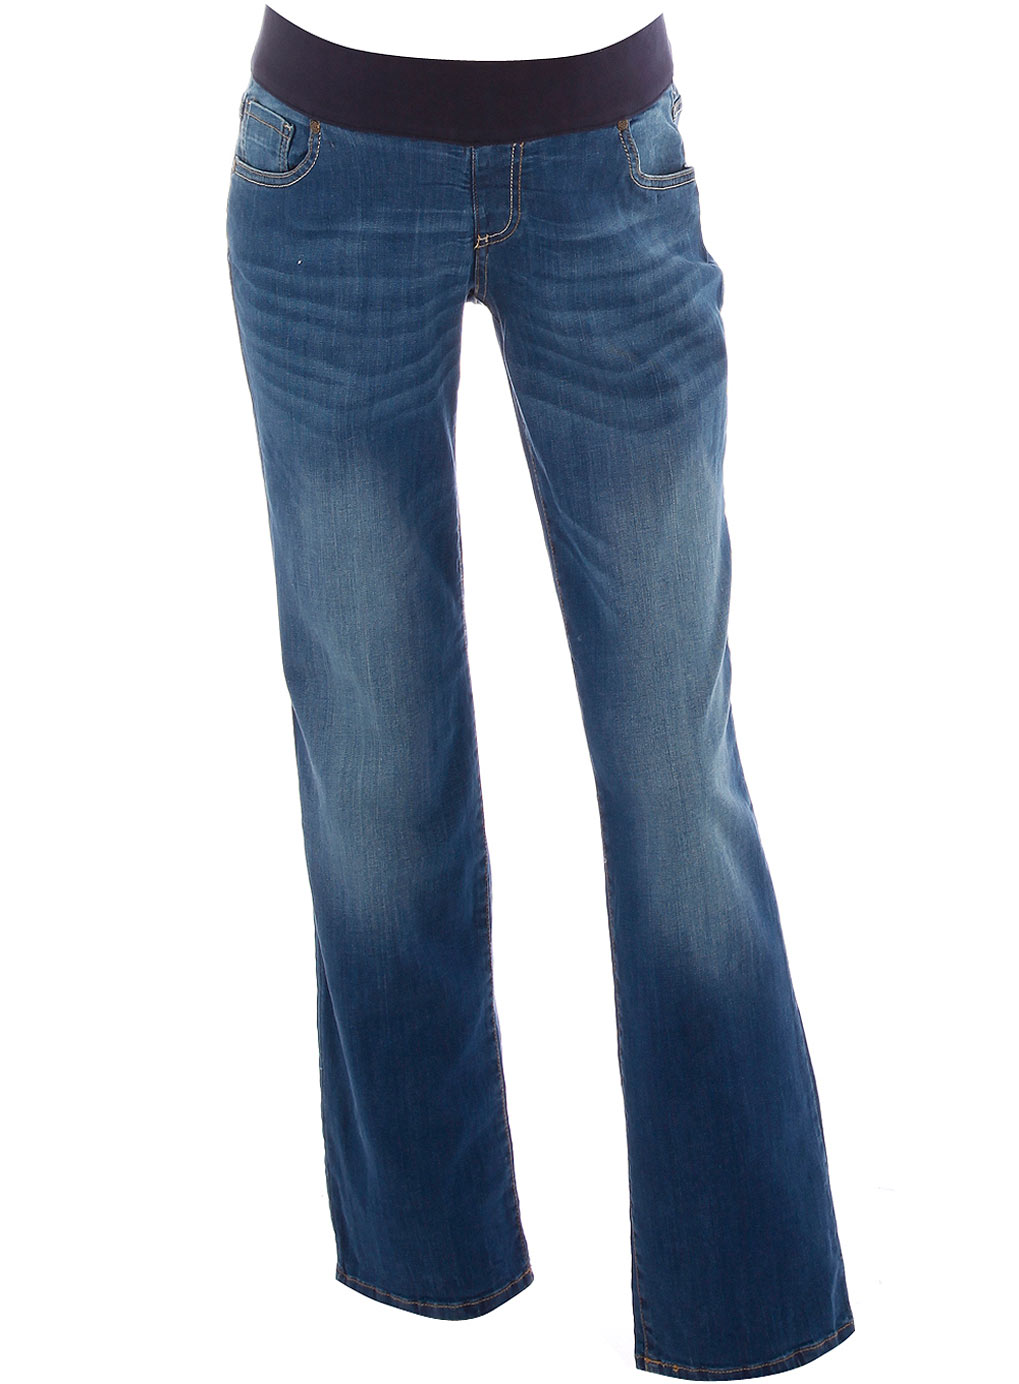 Bumptastic: Maternity Jeans